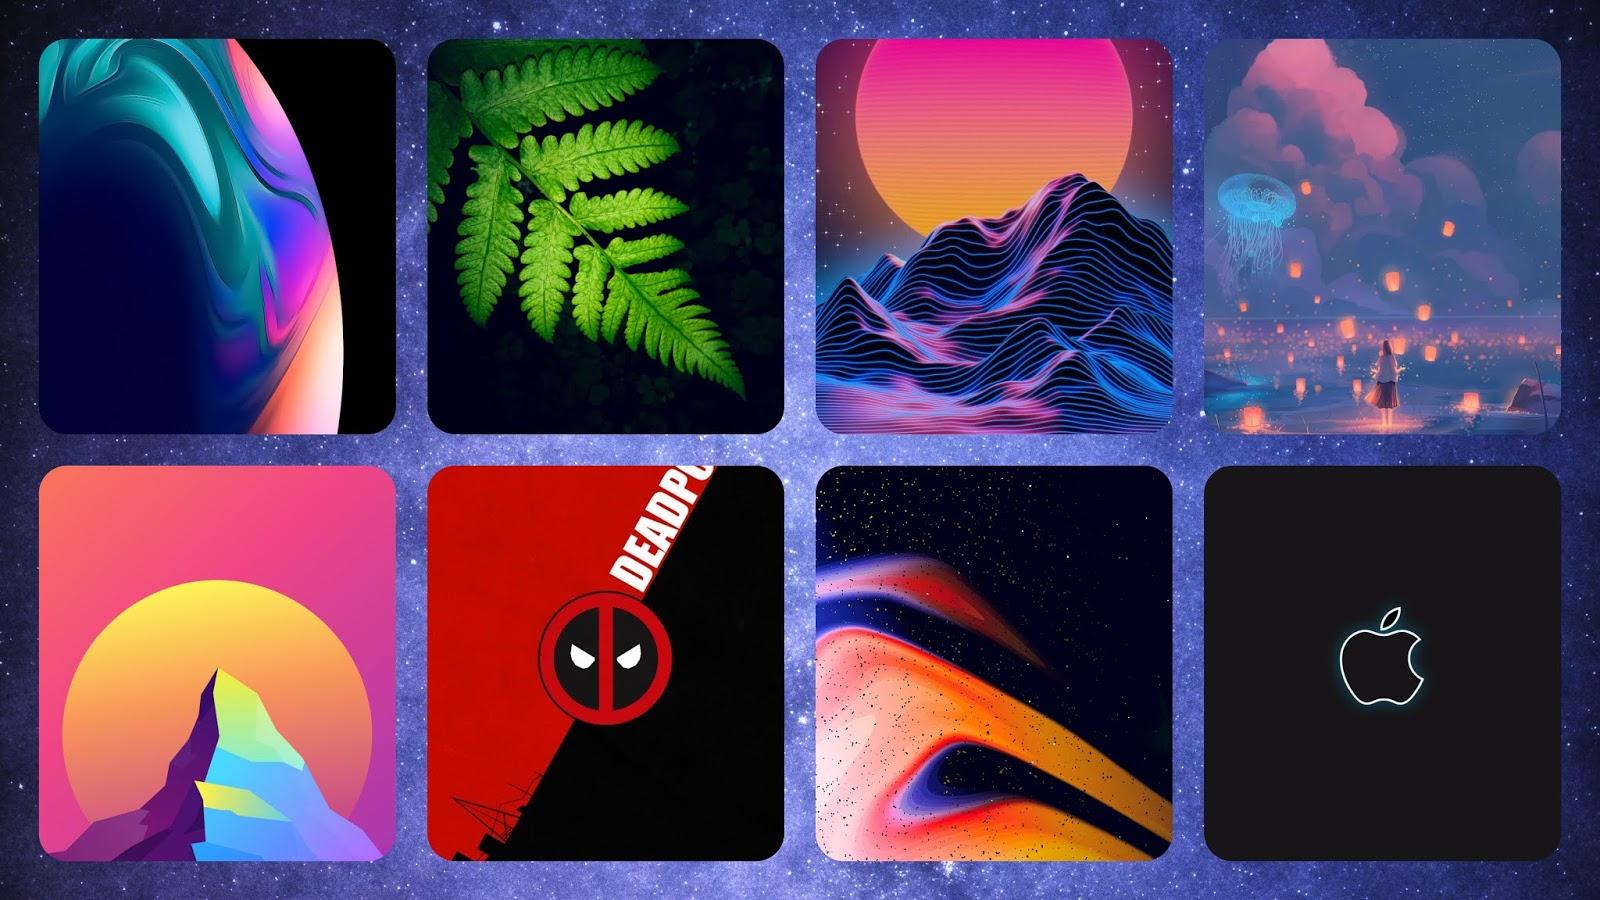 Best Iphone Wallpapers 2020